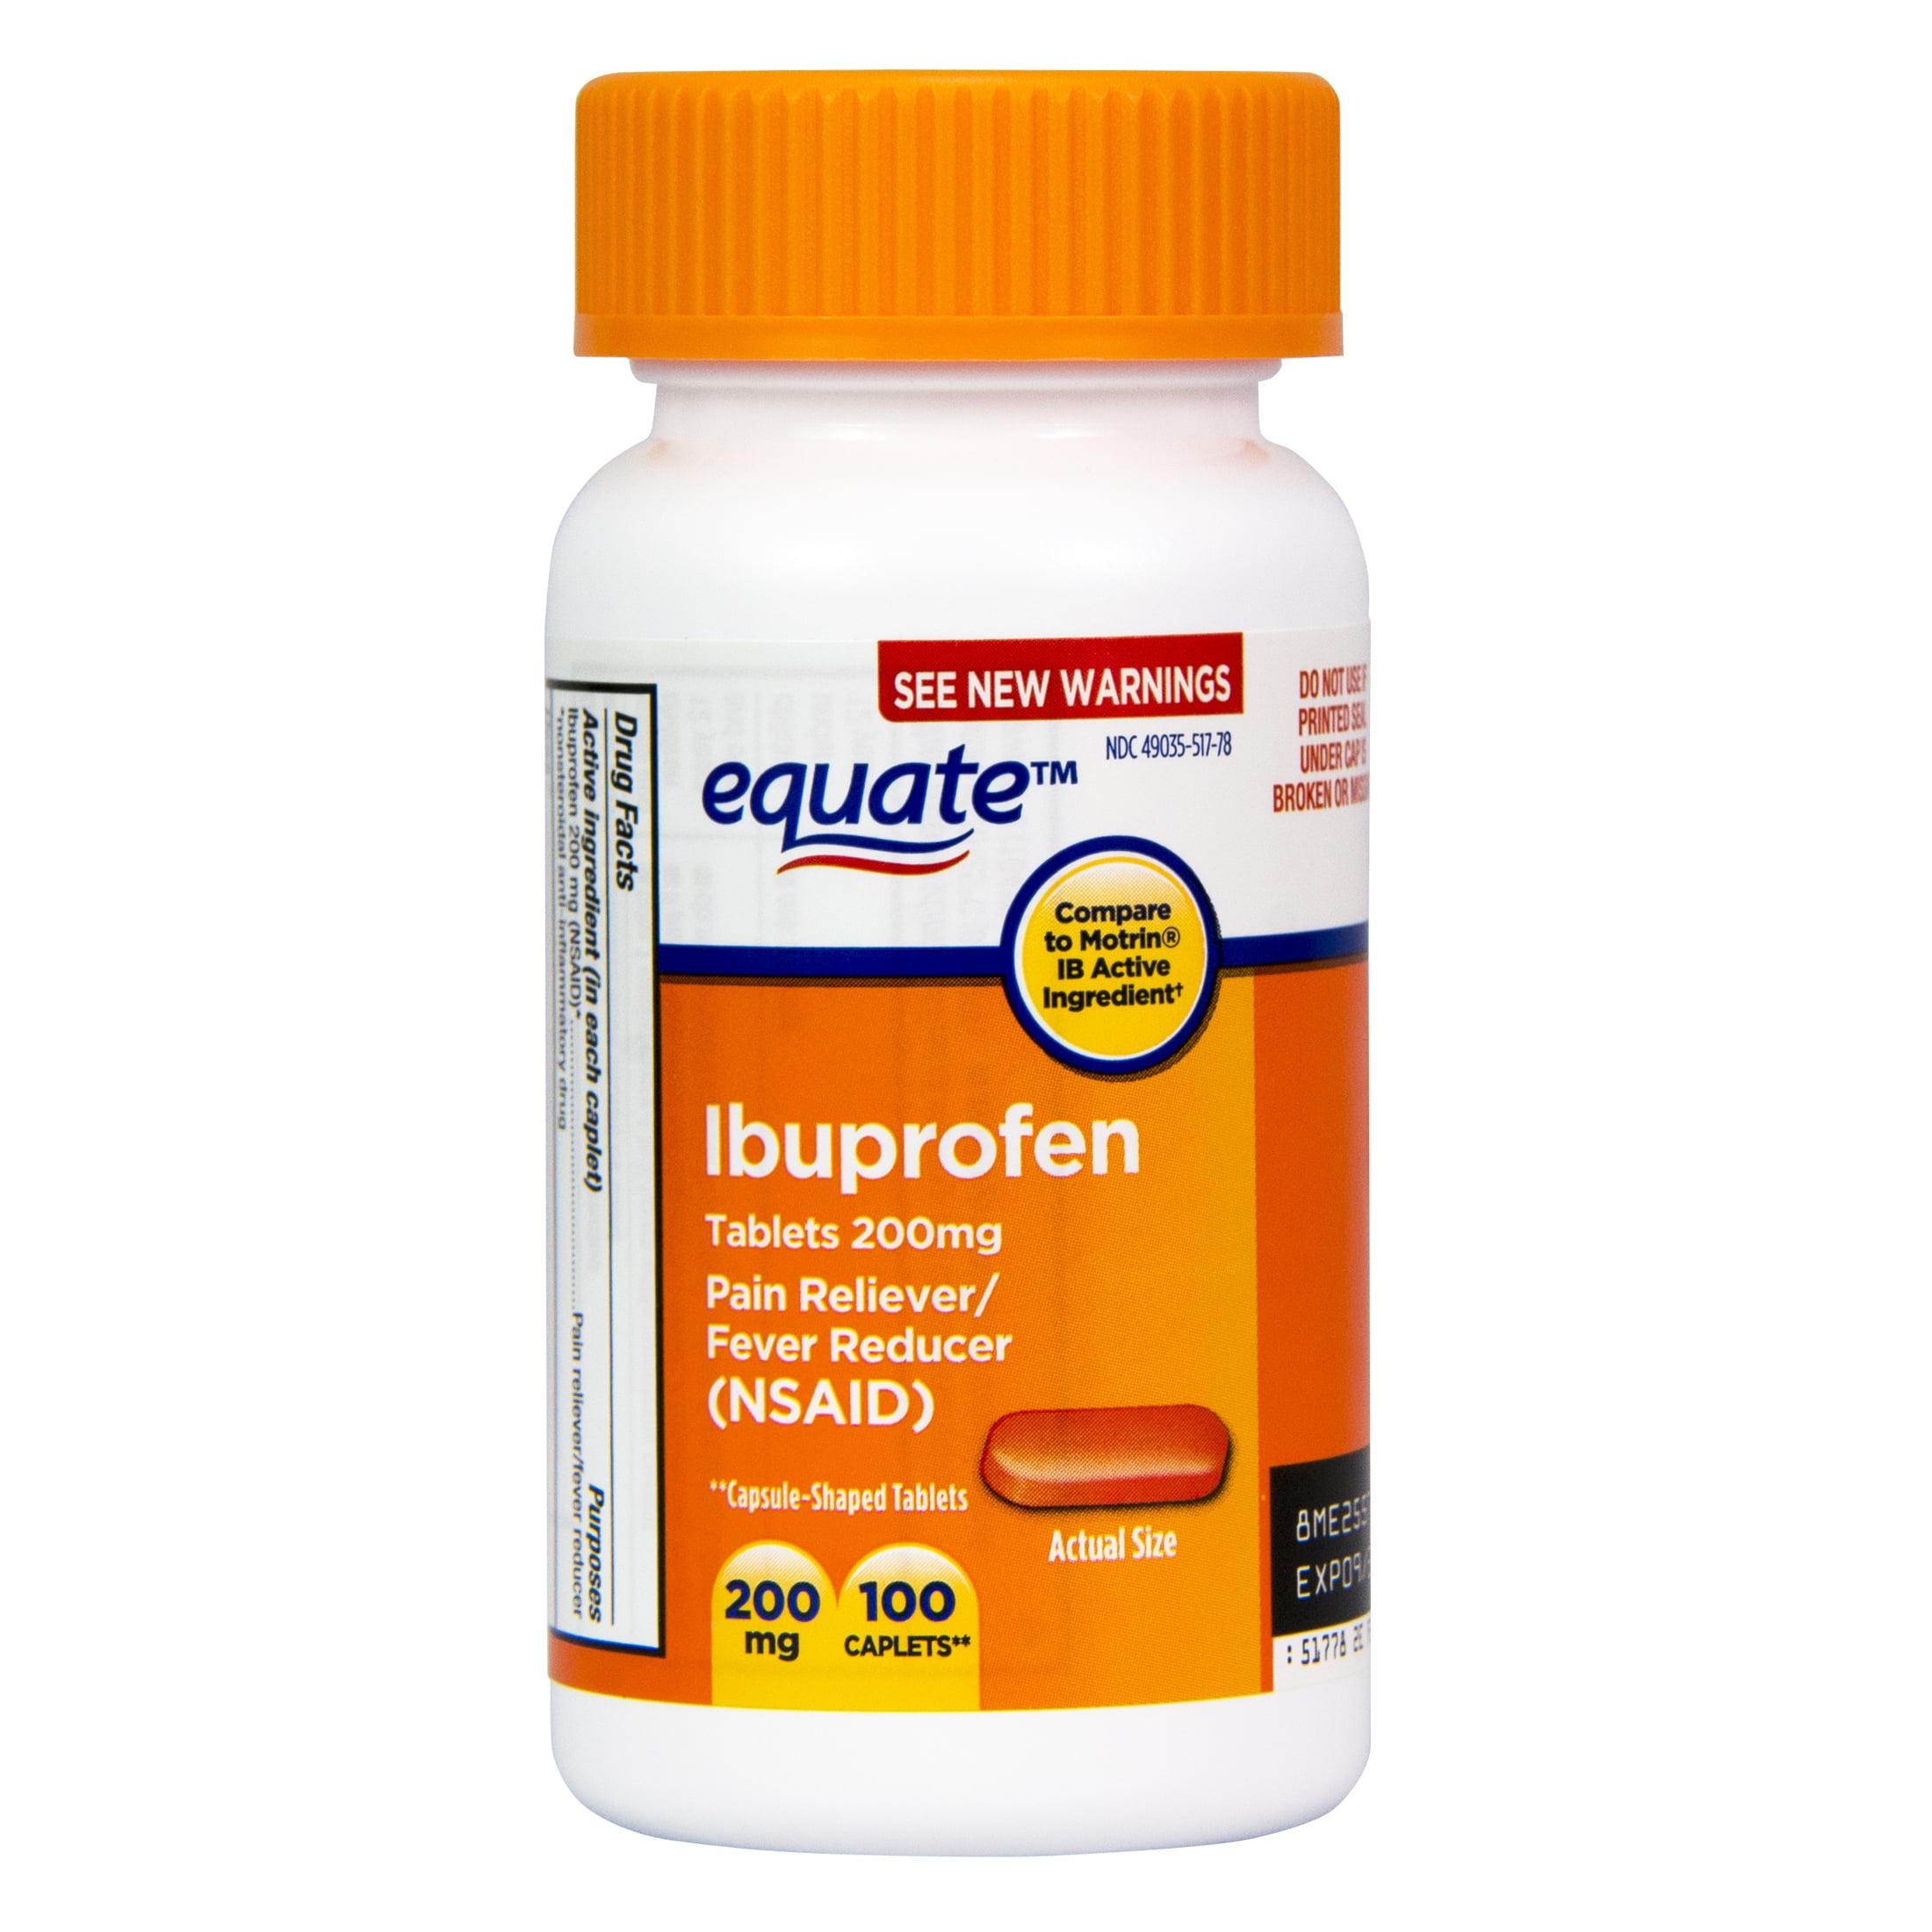 Equate Pain Relief Ibuprofen Caplets, 200 mg, 100 Ct